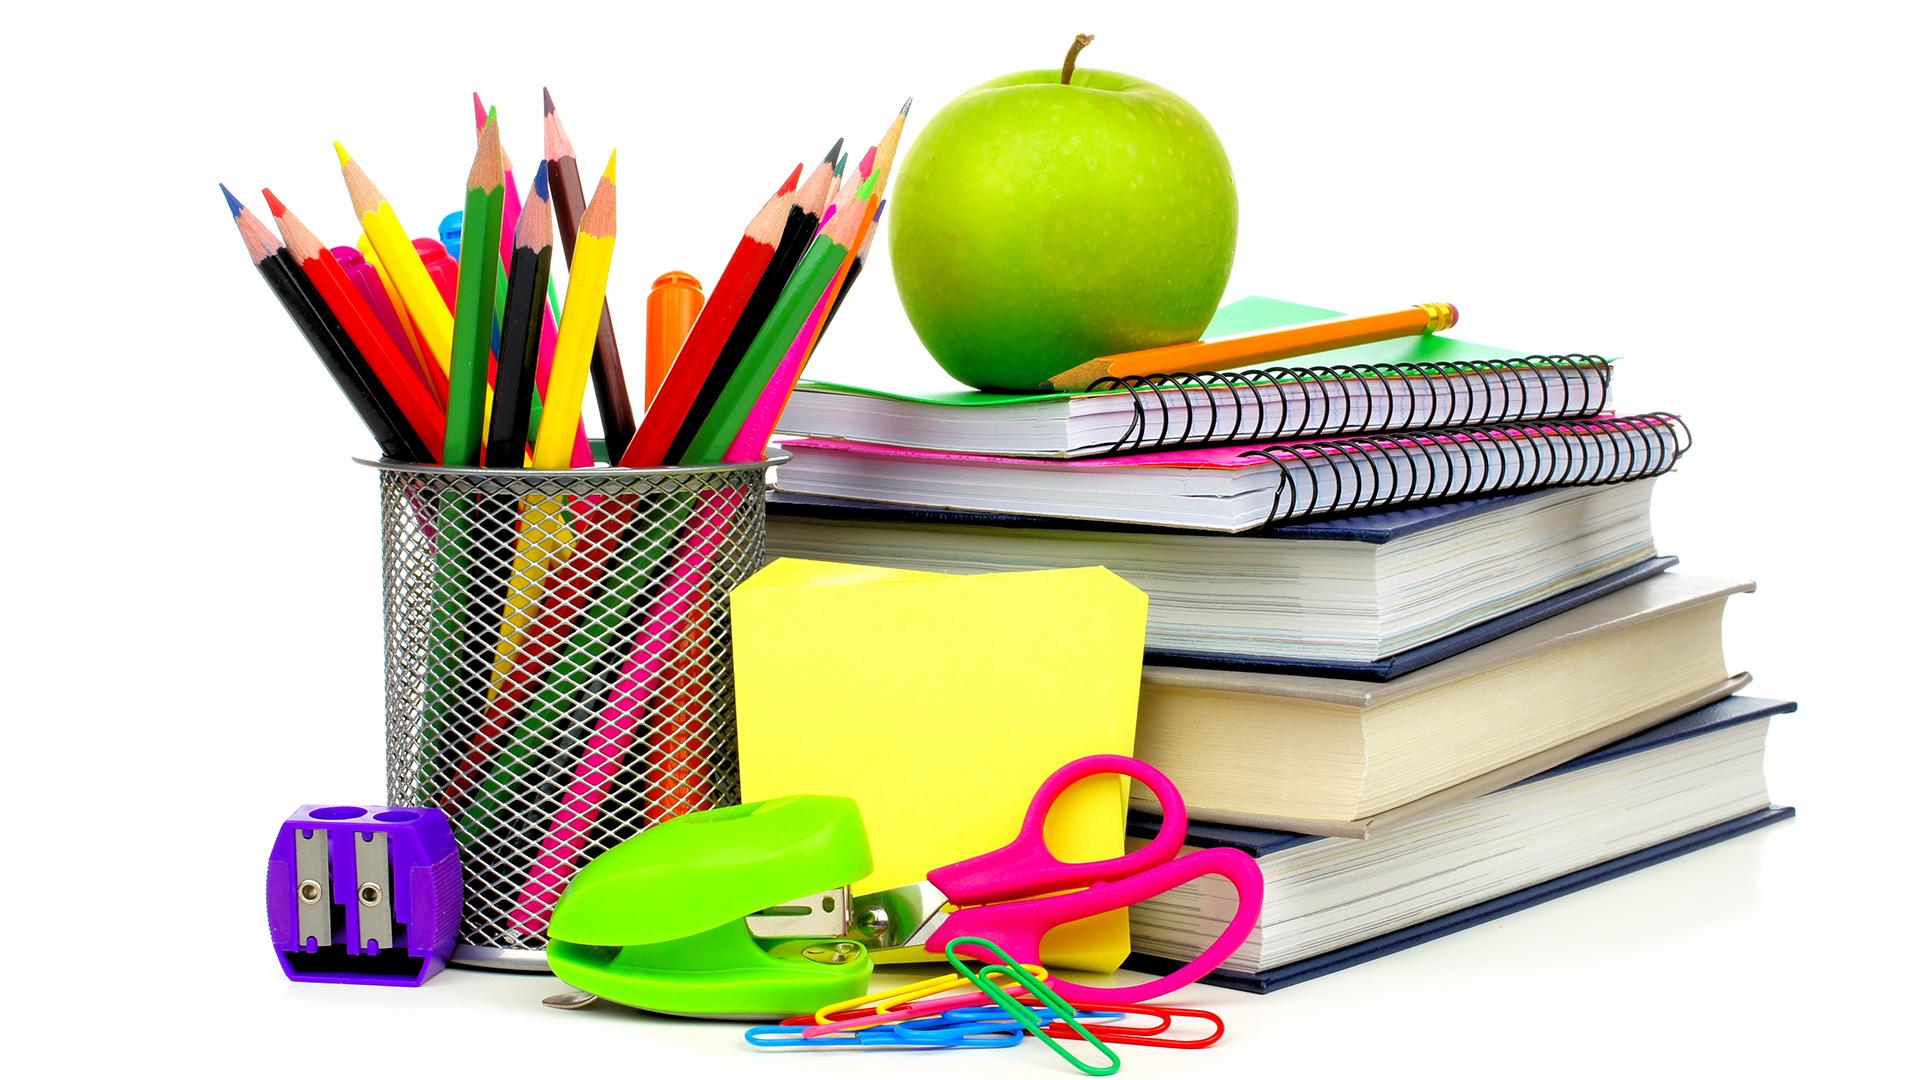 Lista de útiles Pre-Kinder y Kinder 2016